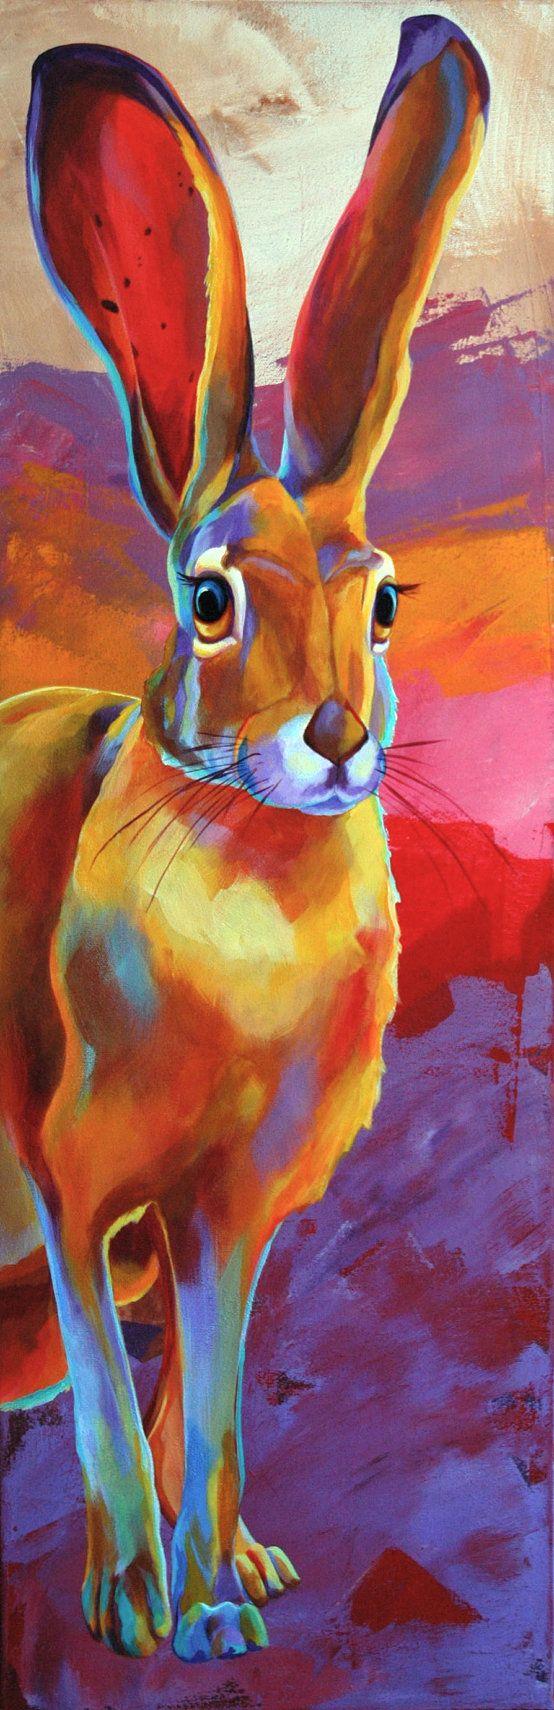 Jack Rabbit • CorinaStMartinArt